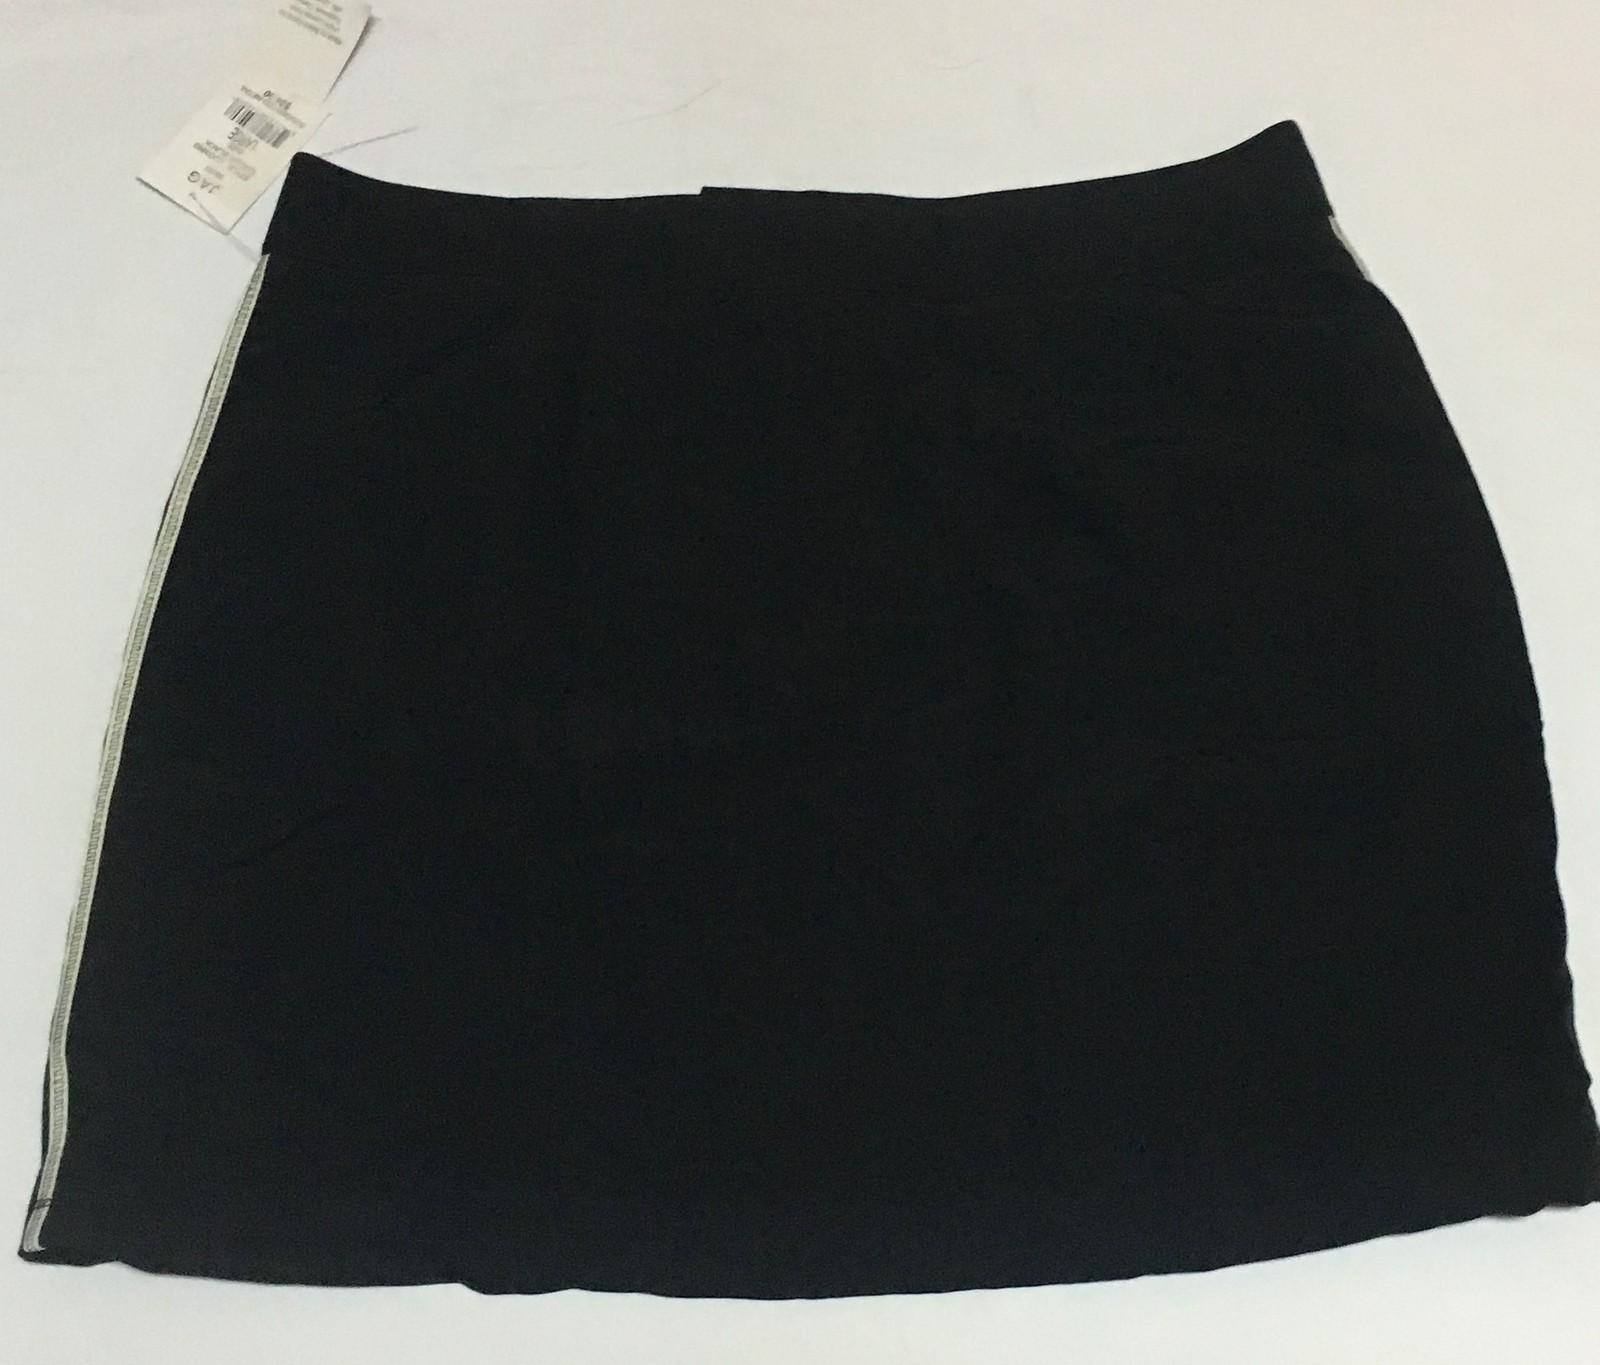 JAG Black Active Performance Skirt SZ L NWT